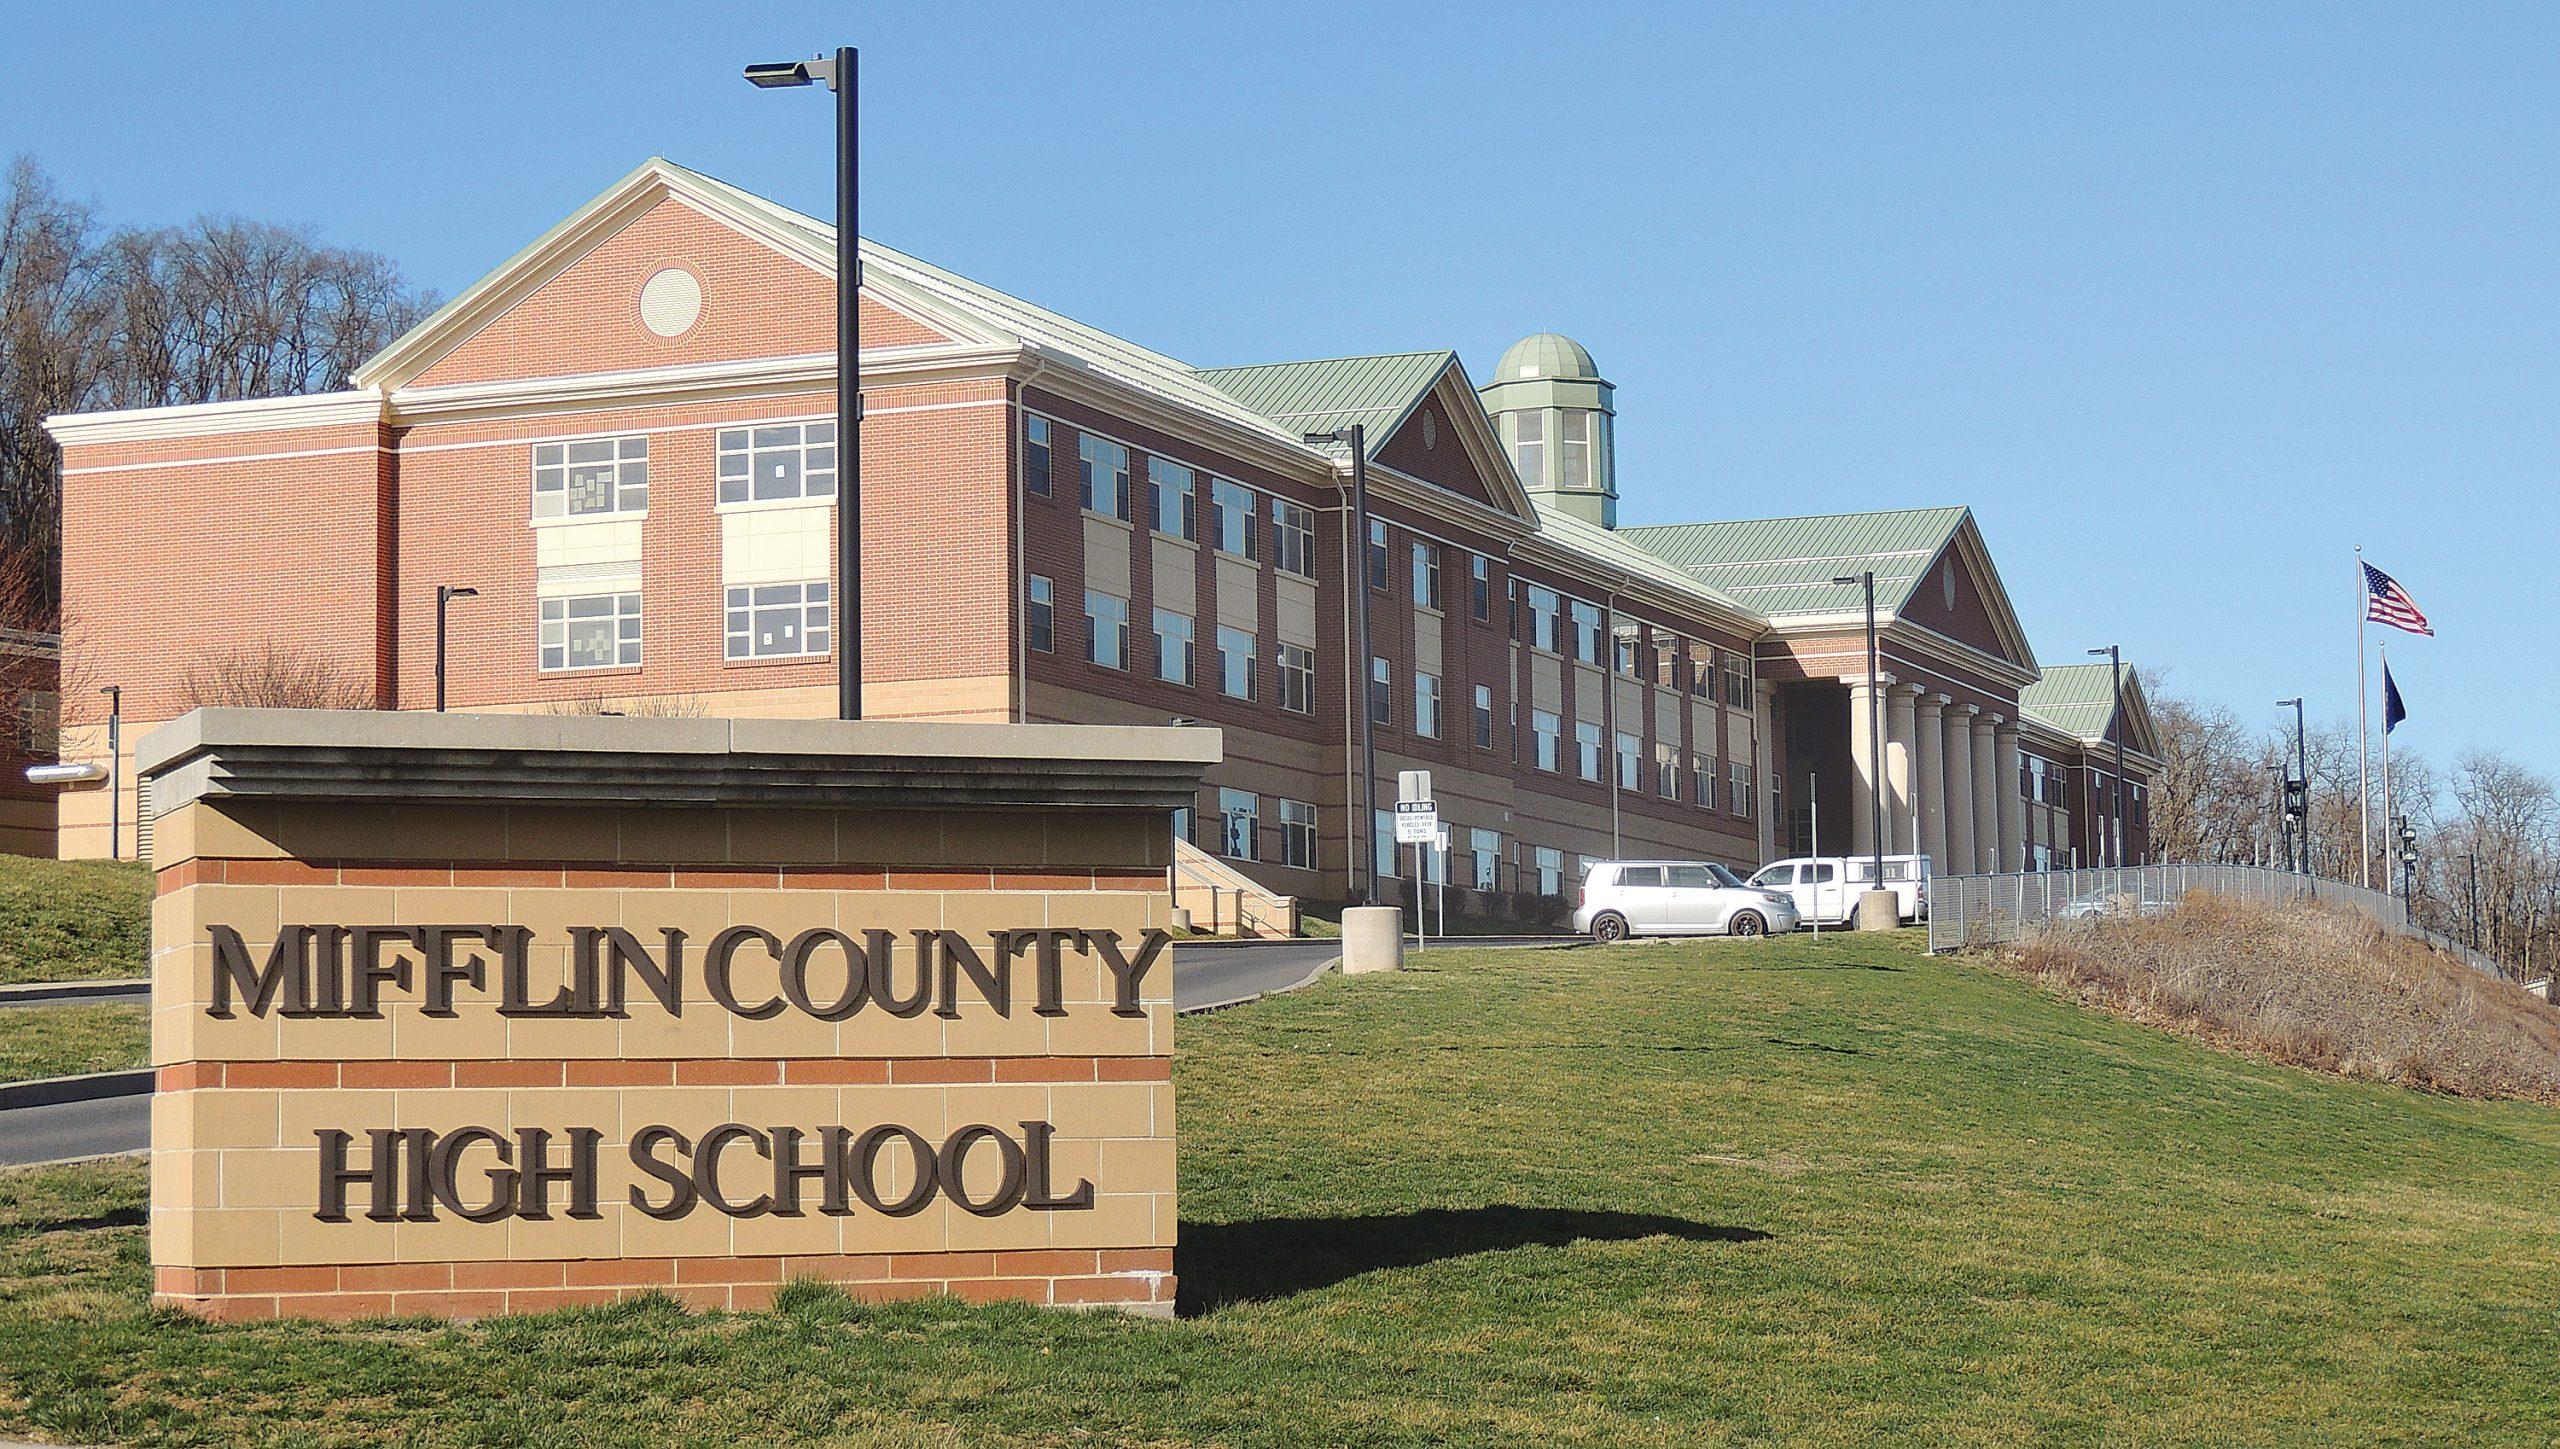 Area Schools Plan For 2 Week Closure | News, Sports, Jobs Inside Mifflin County School Calendar